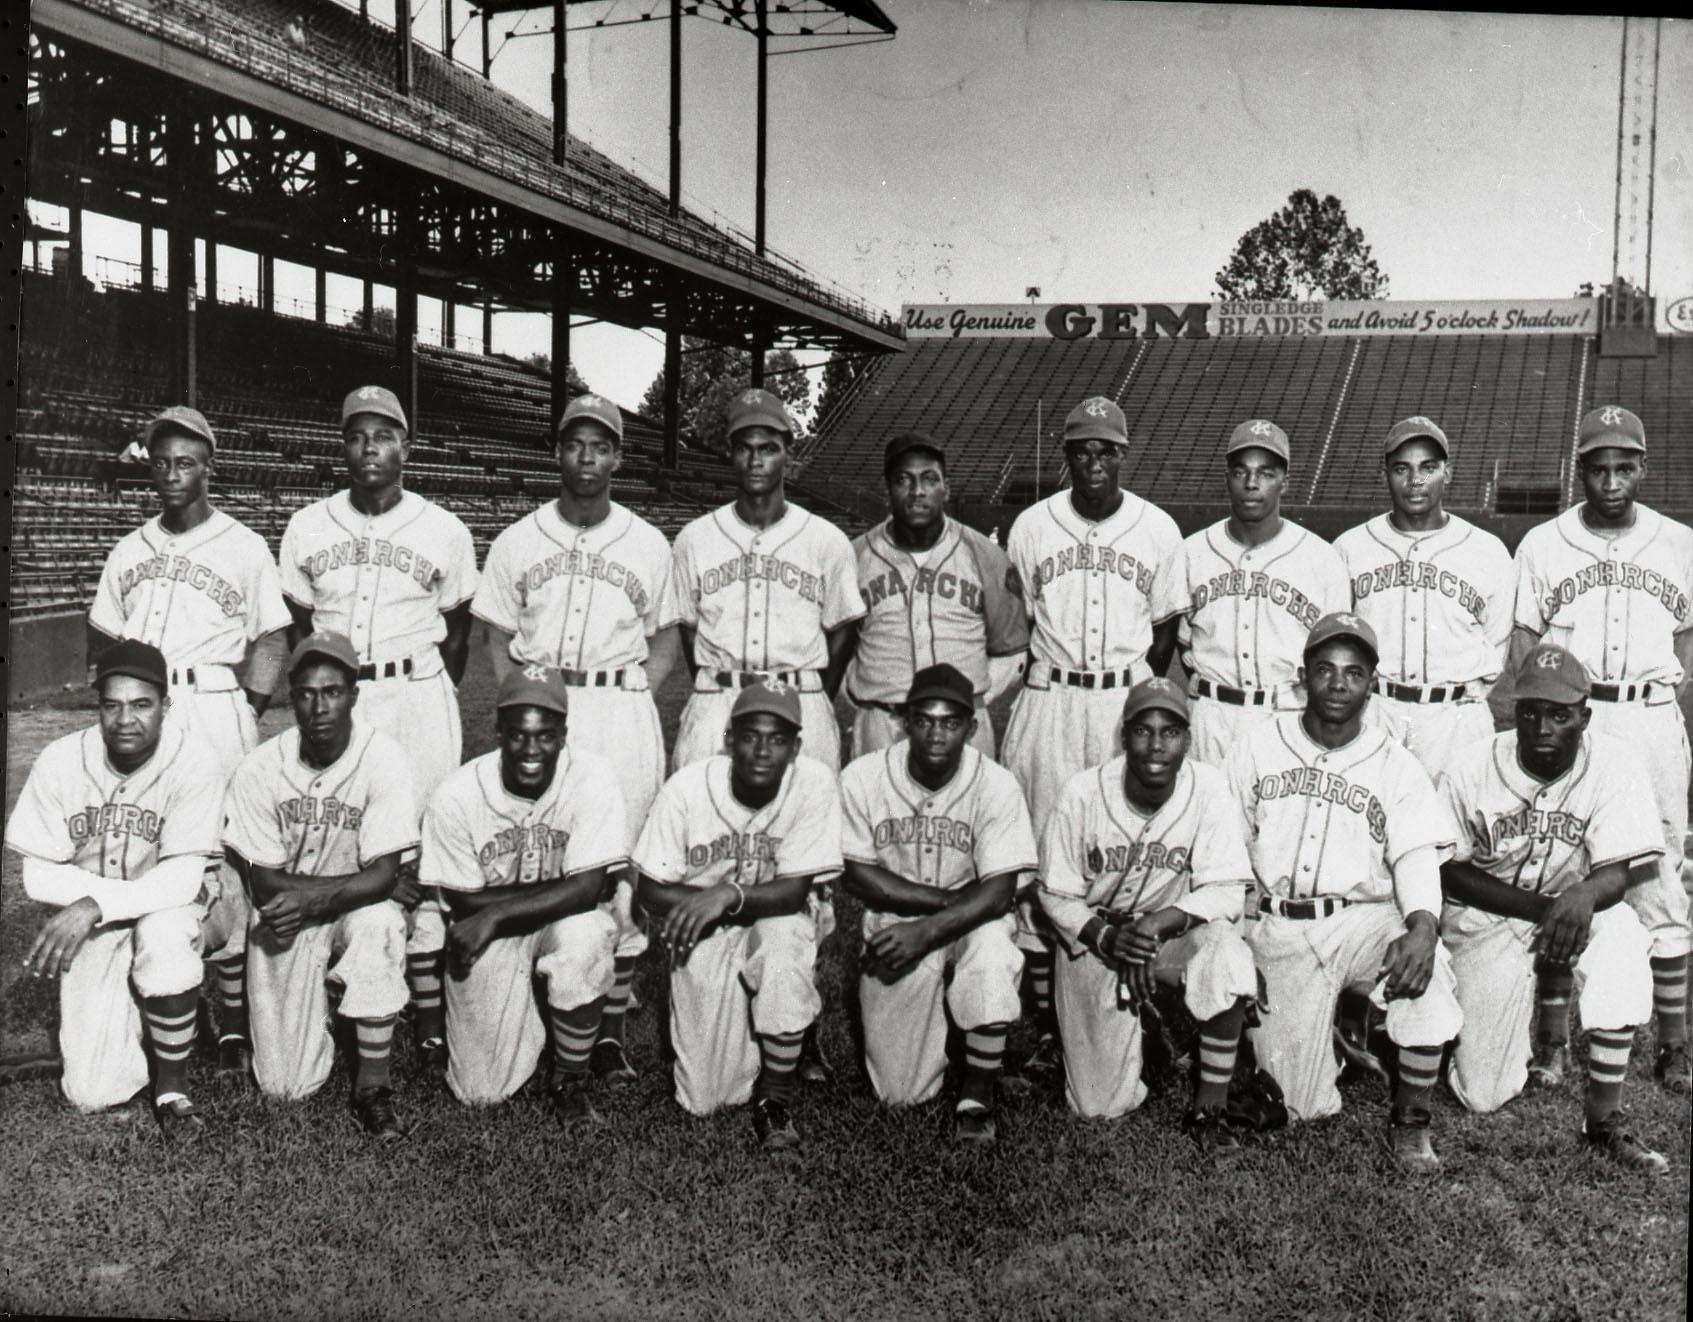 Kansas City Monarchs, 1945